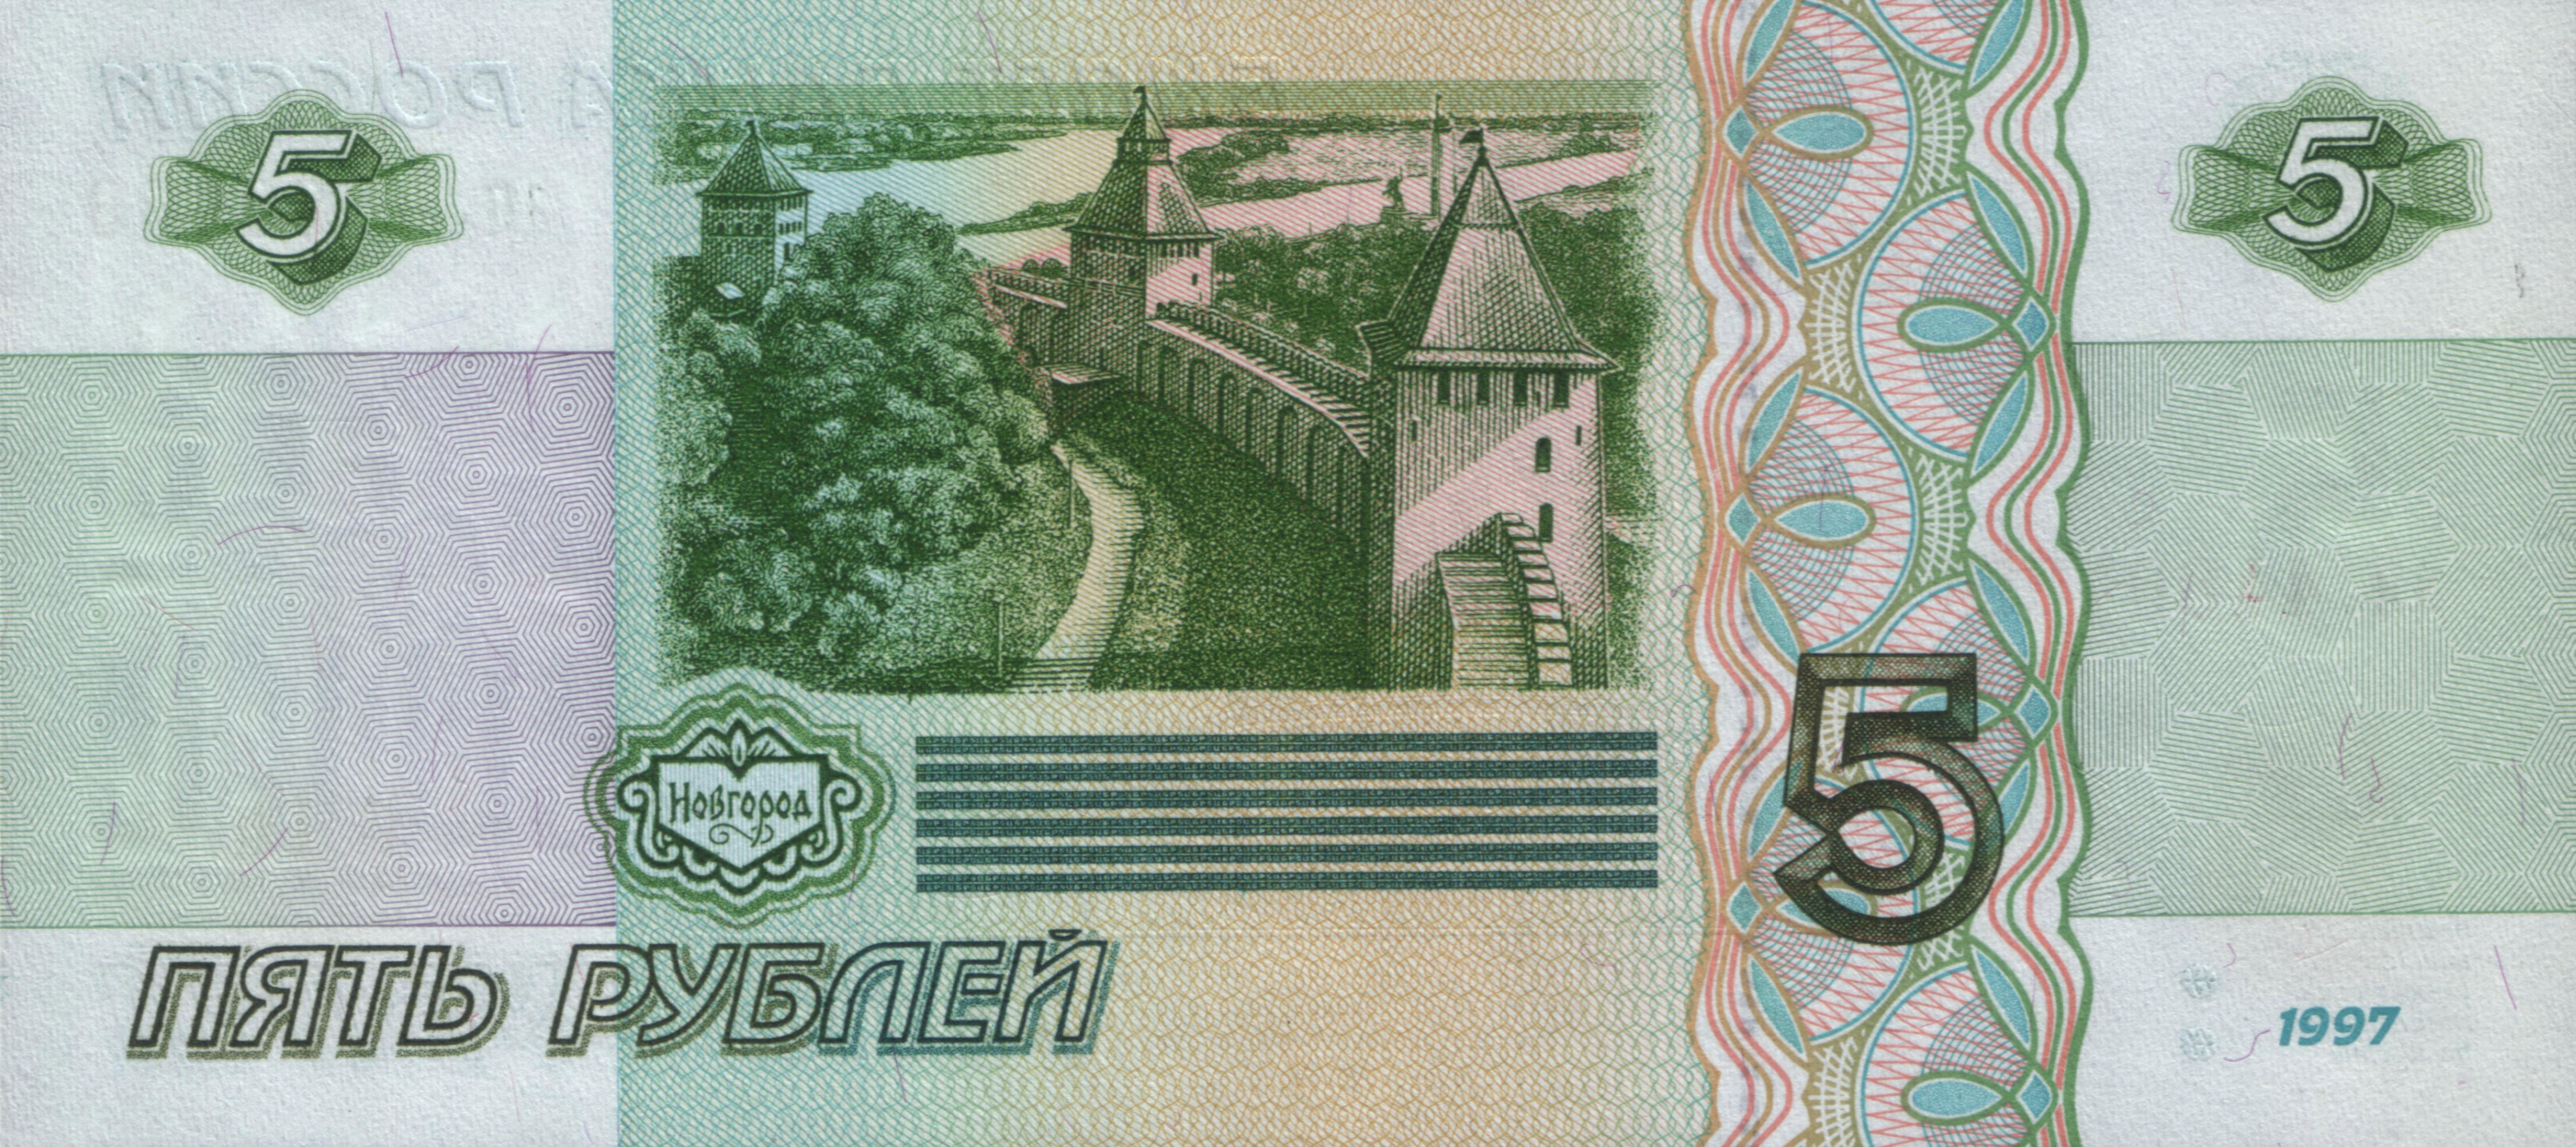 Banknote 5 rubles (1997) back.jpg